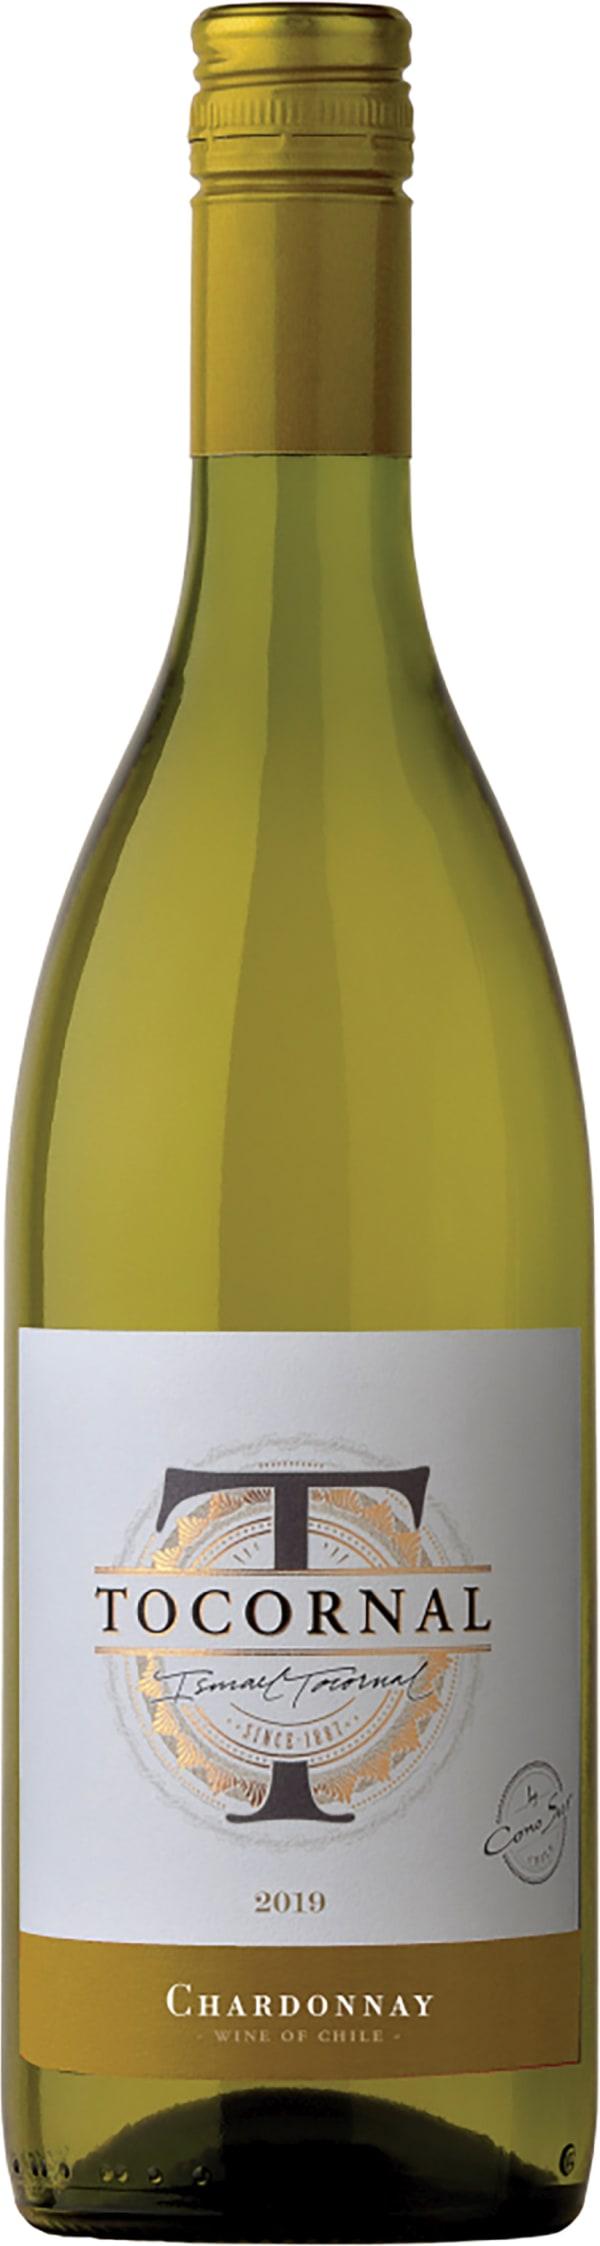 Cono Sur Tocornal Chardonnay 2019